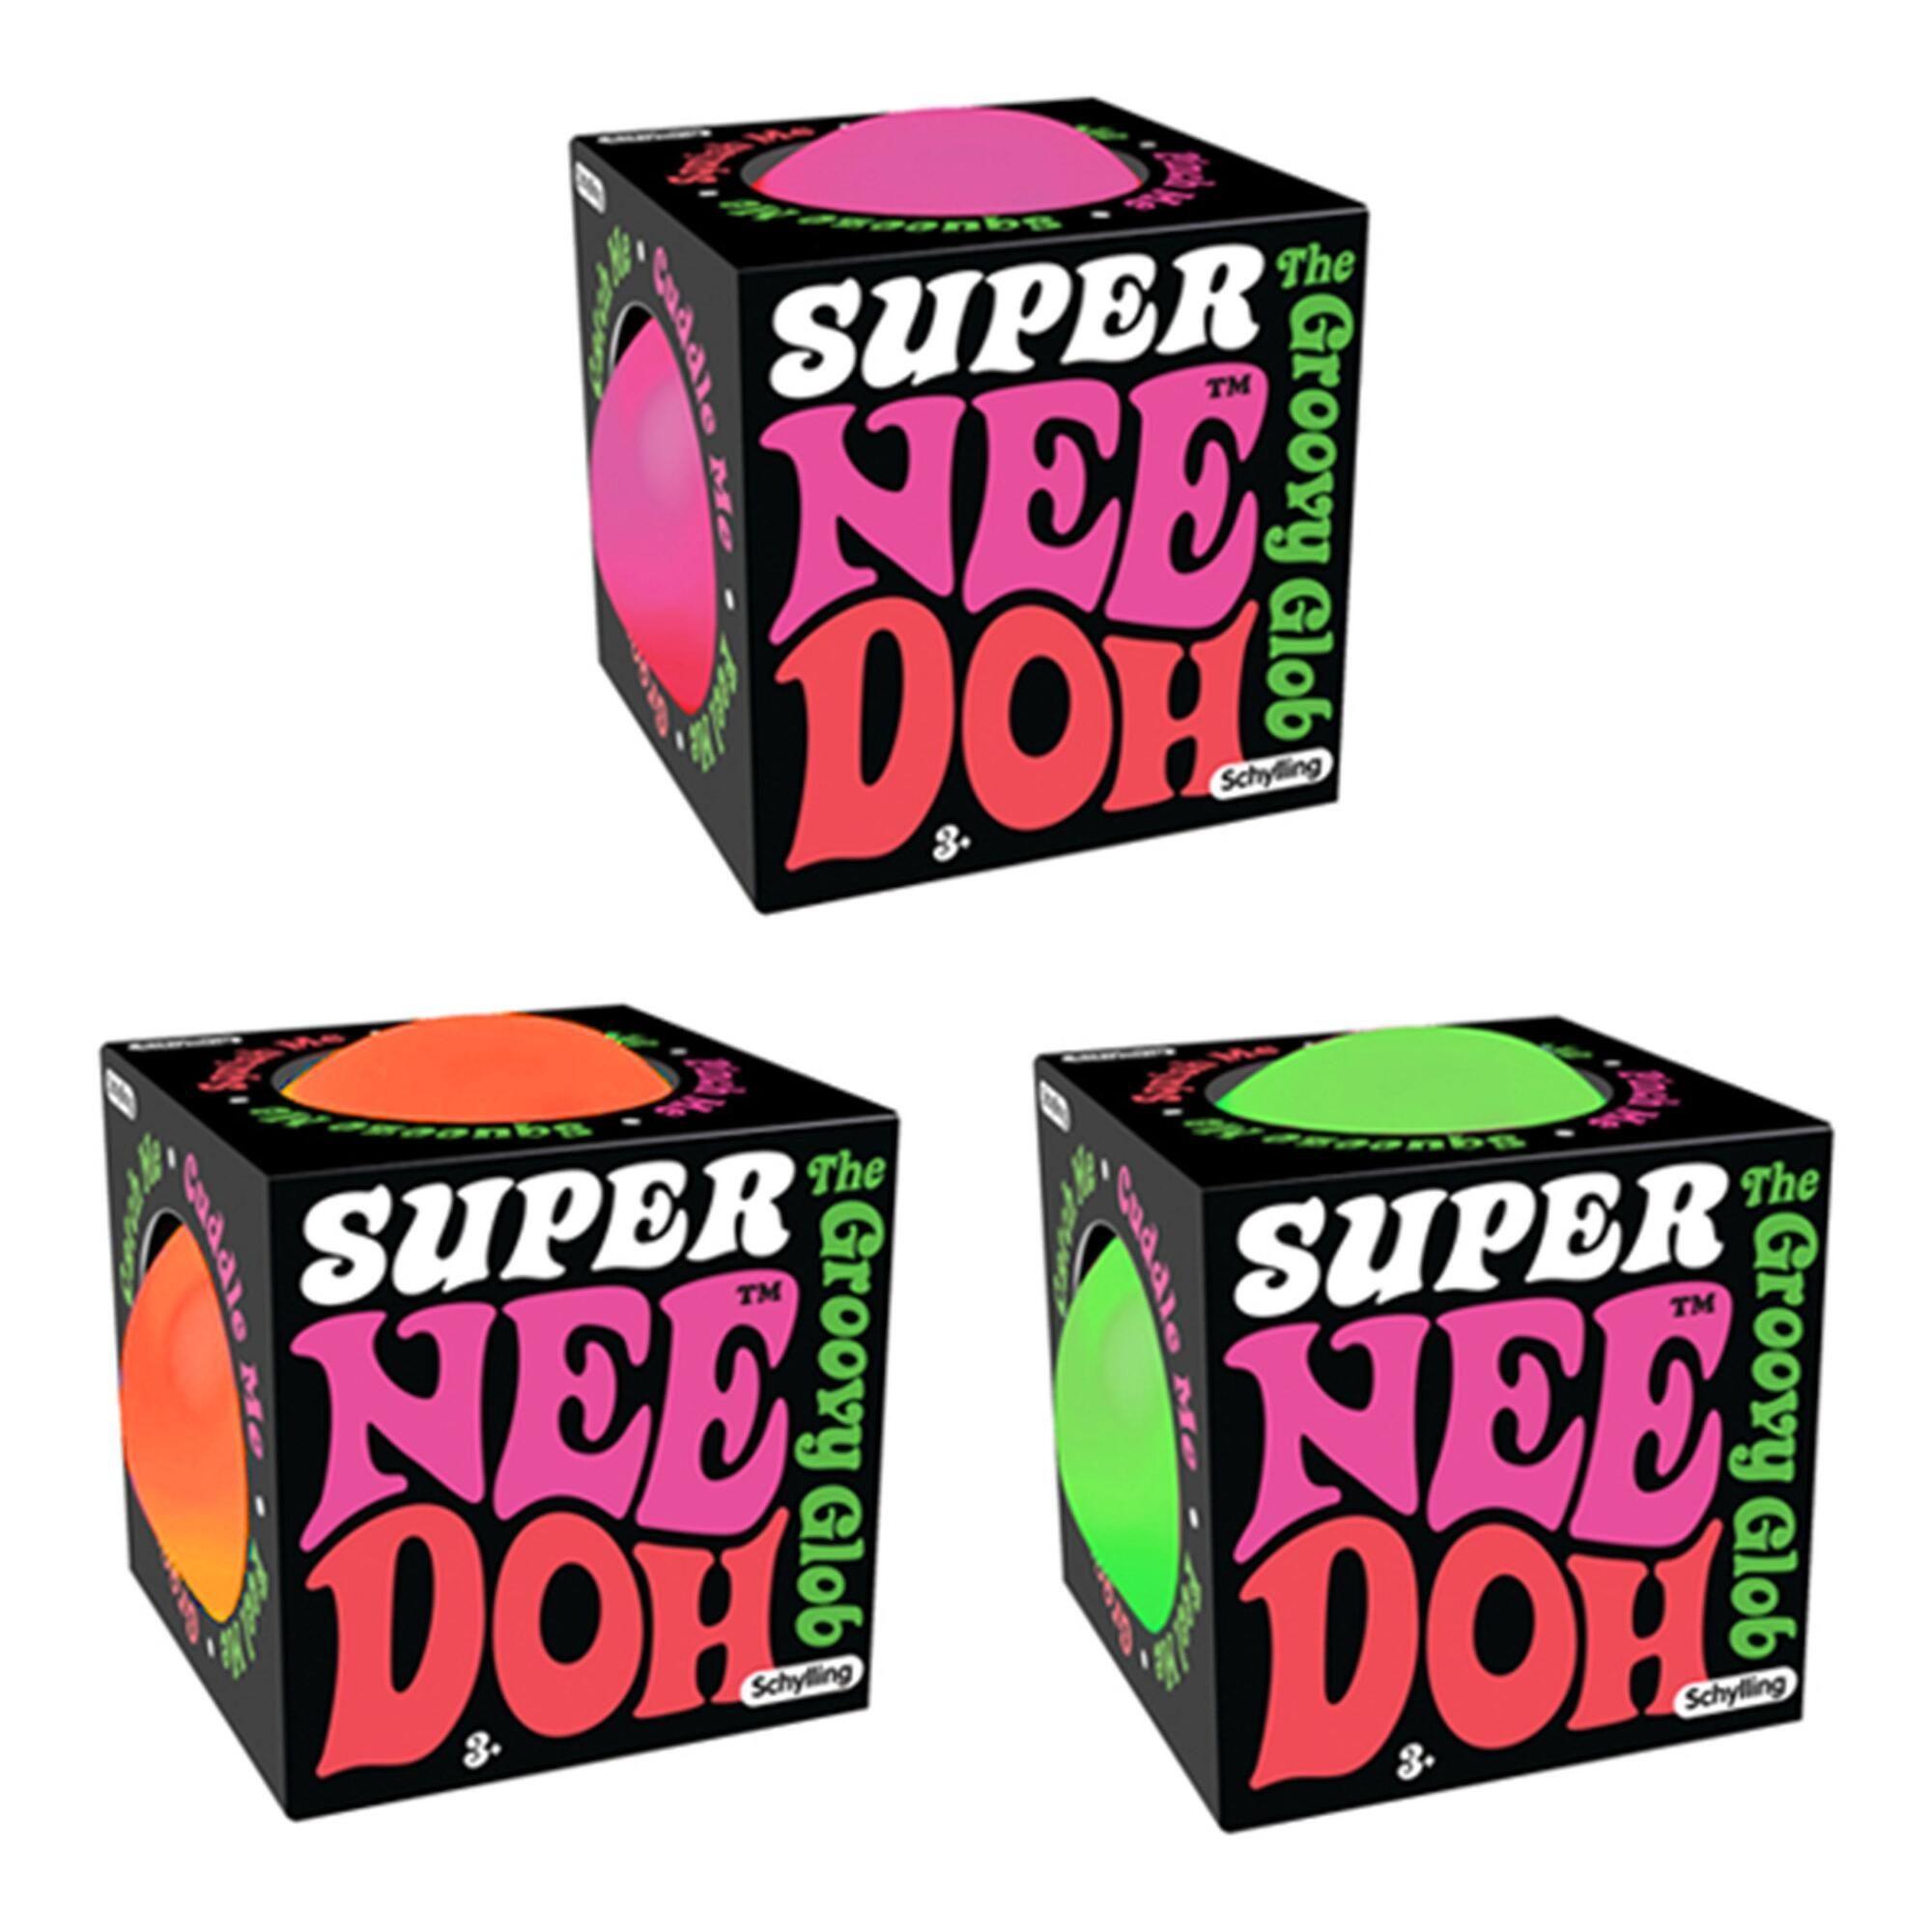 violon sensorielle Stress Ball 3+ ans Fidget Super NEE-doh